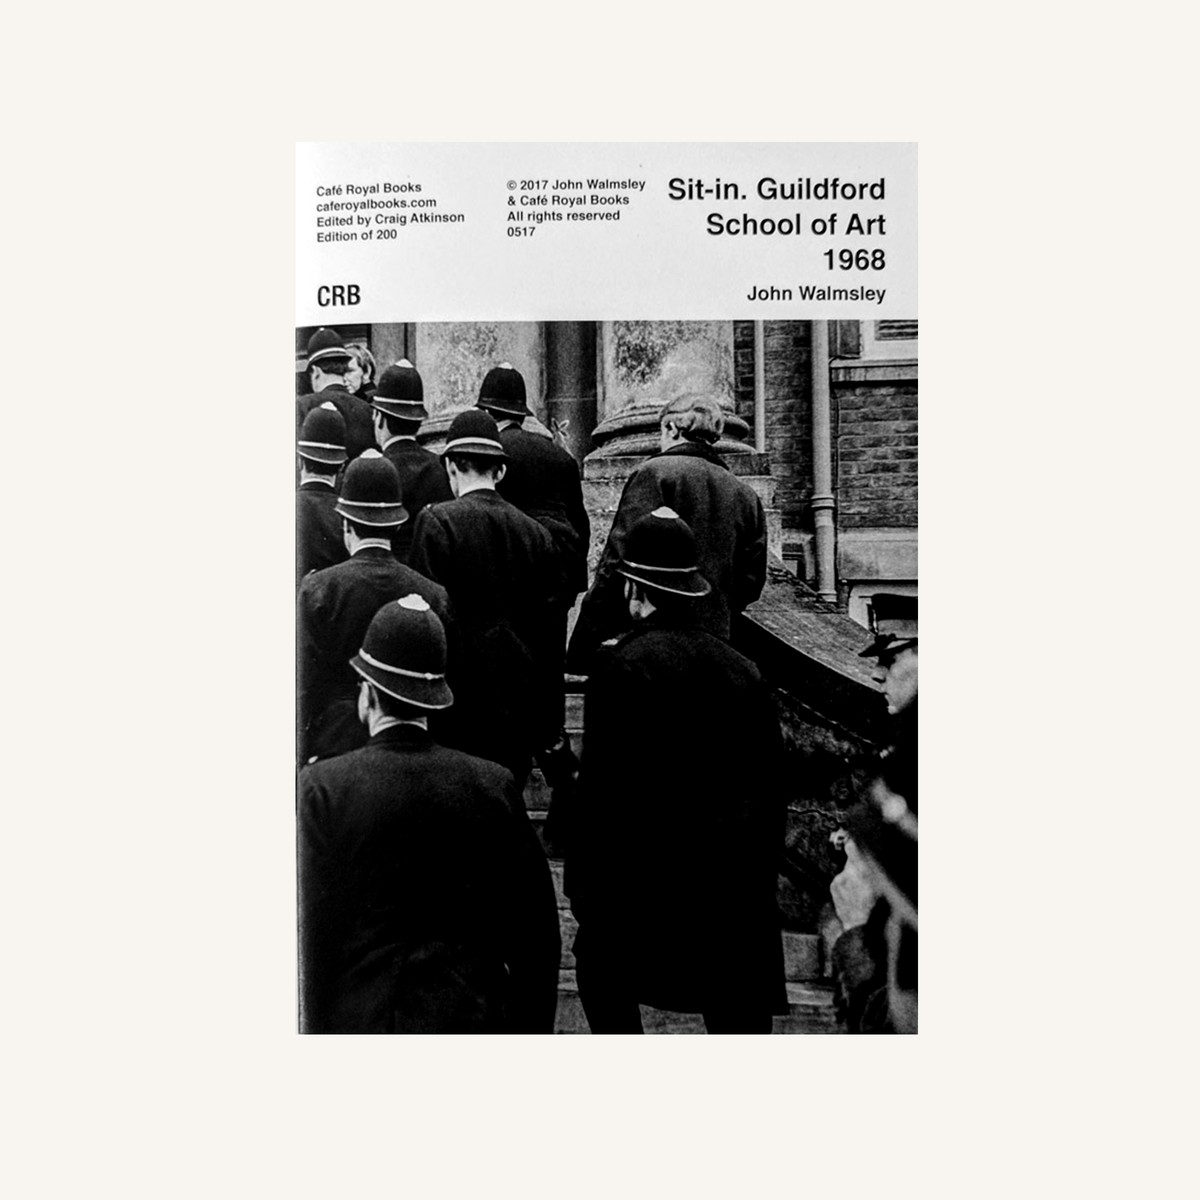 Photo of Art School Sit-in 1968 Photozine